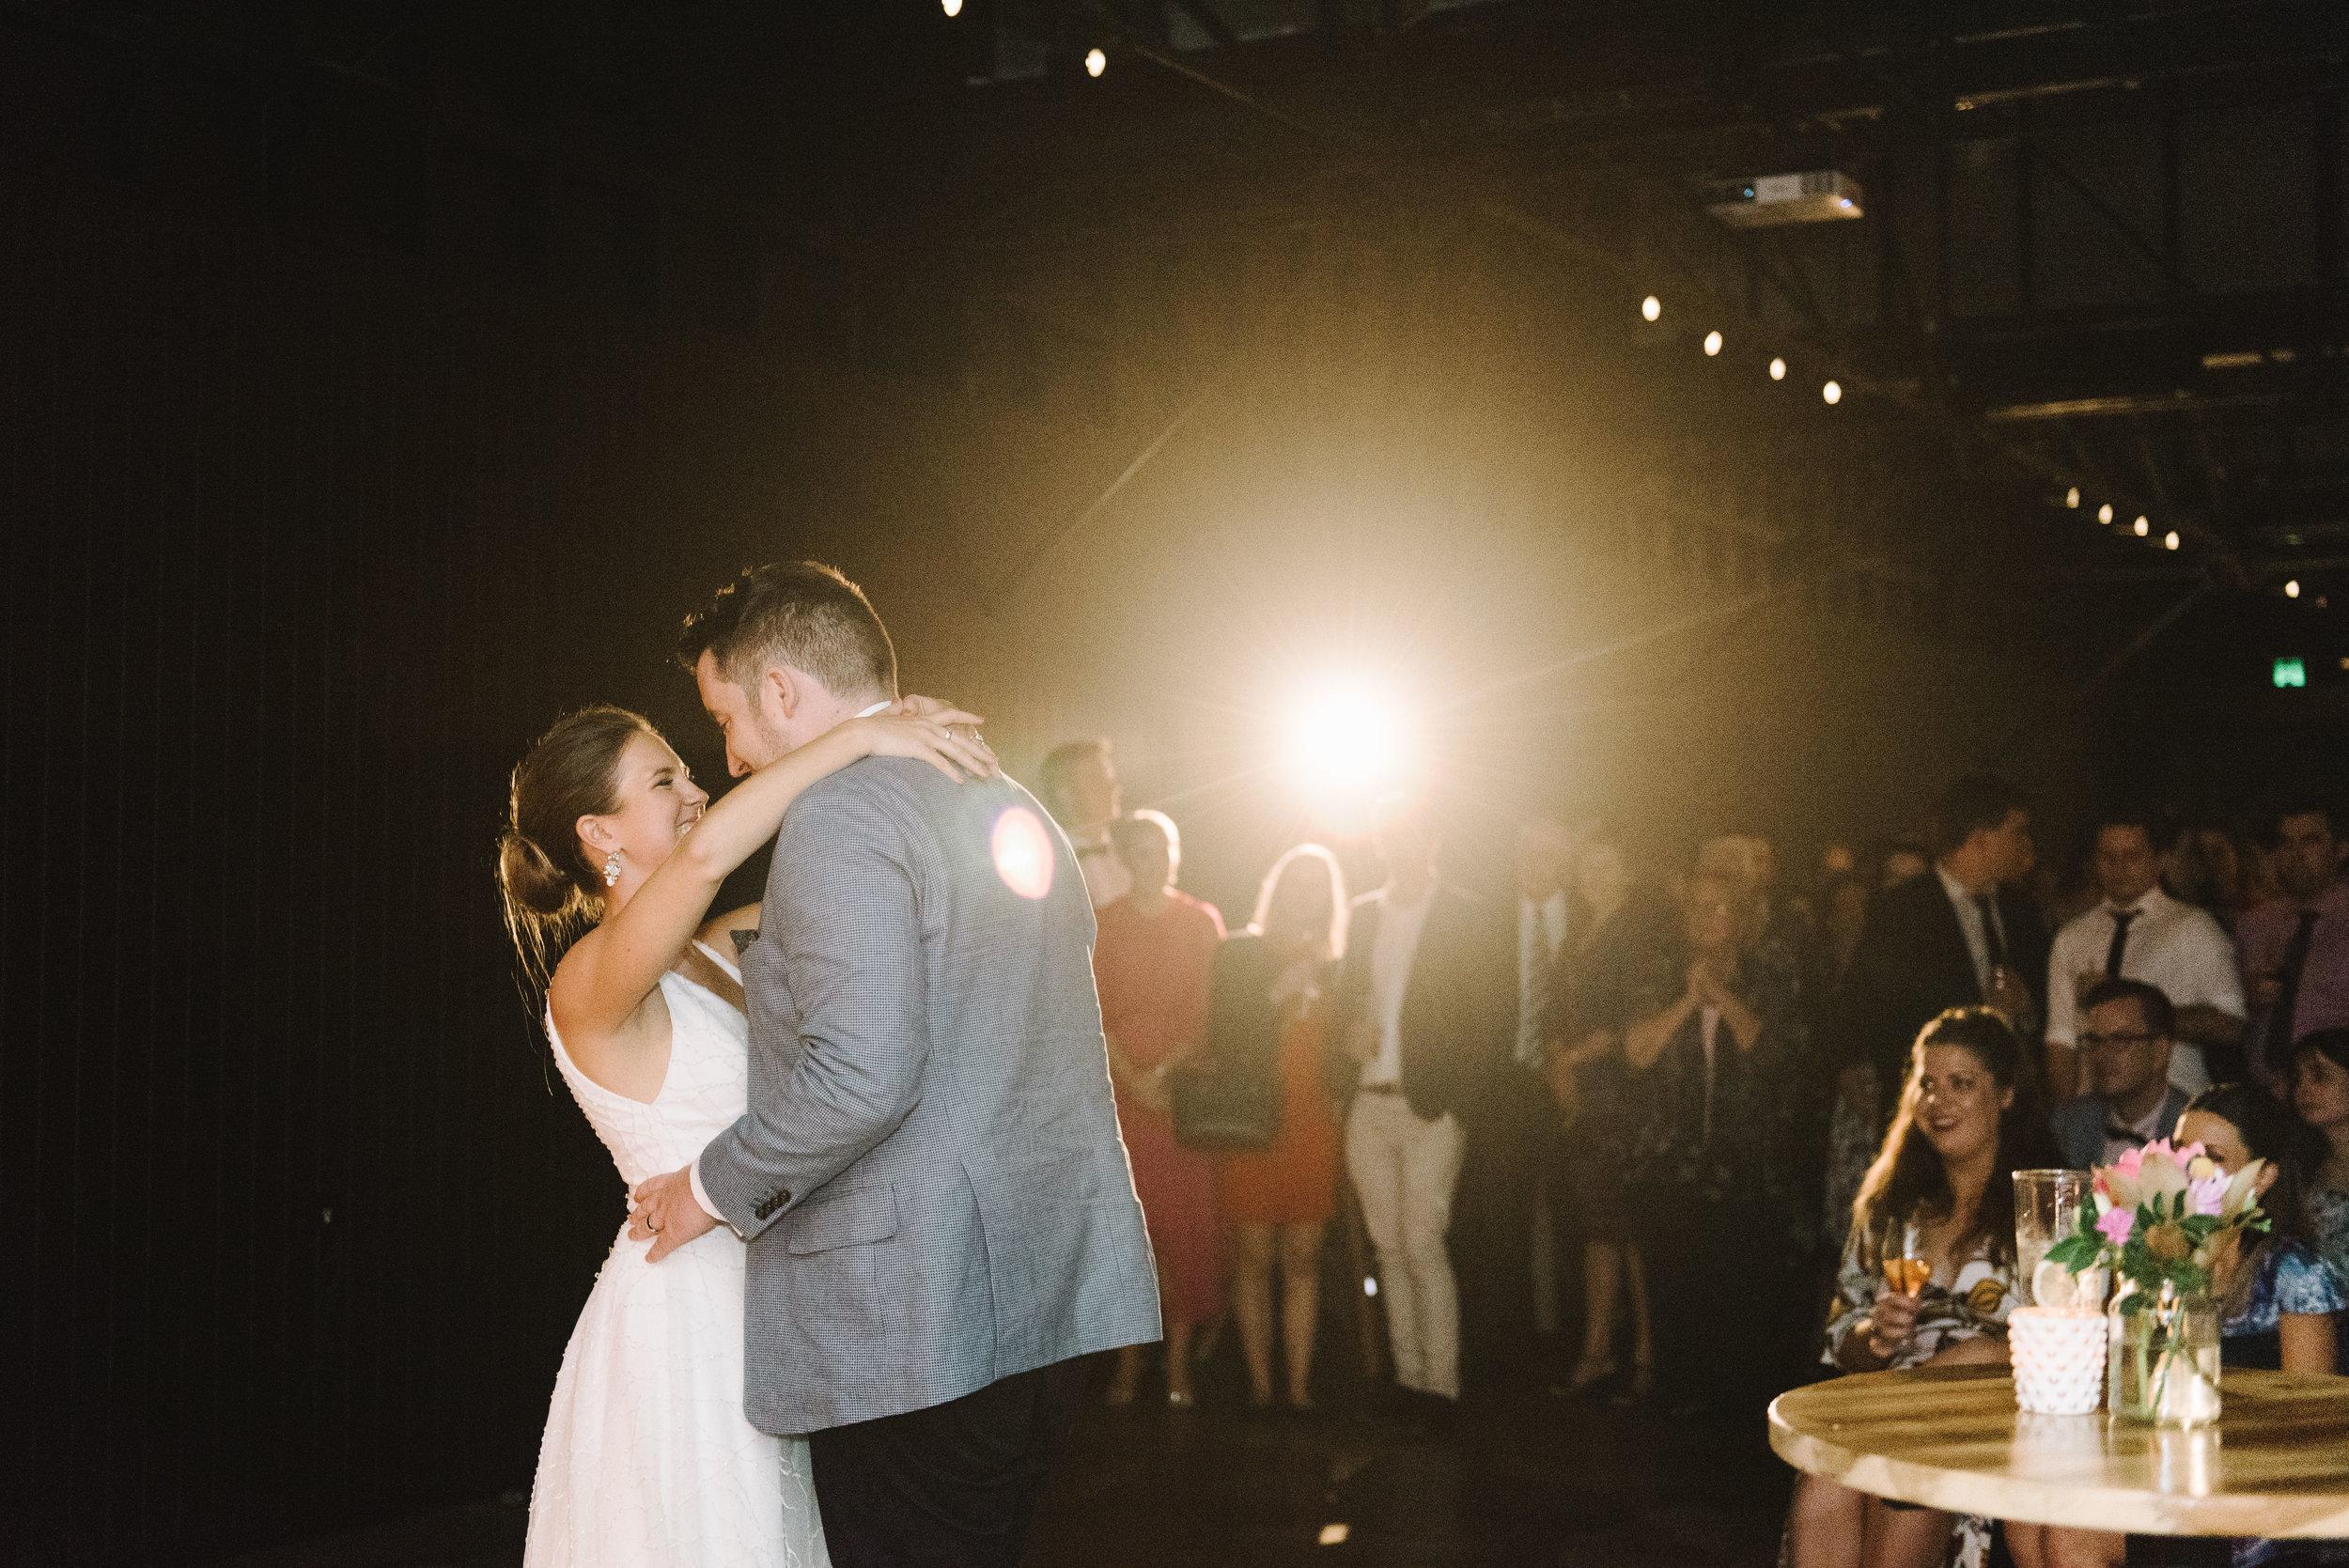 refinery-brisbane-wedding-reception-2.jpg